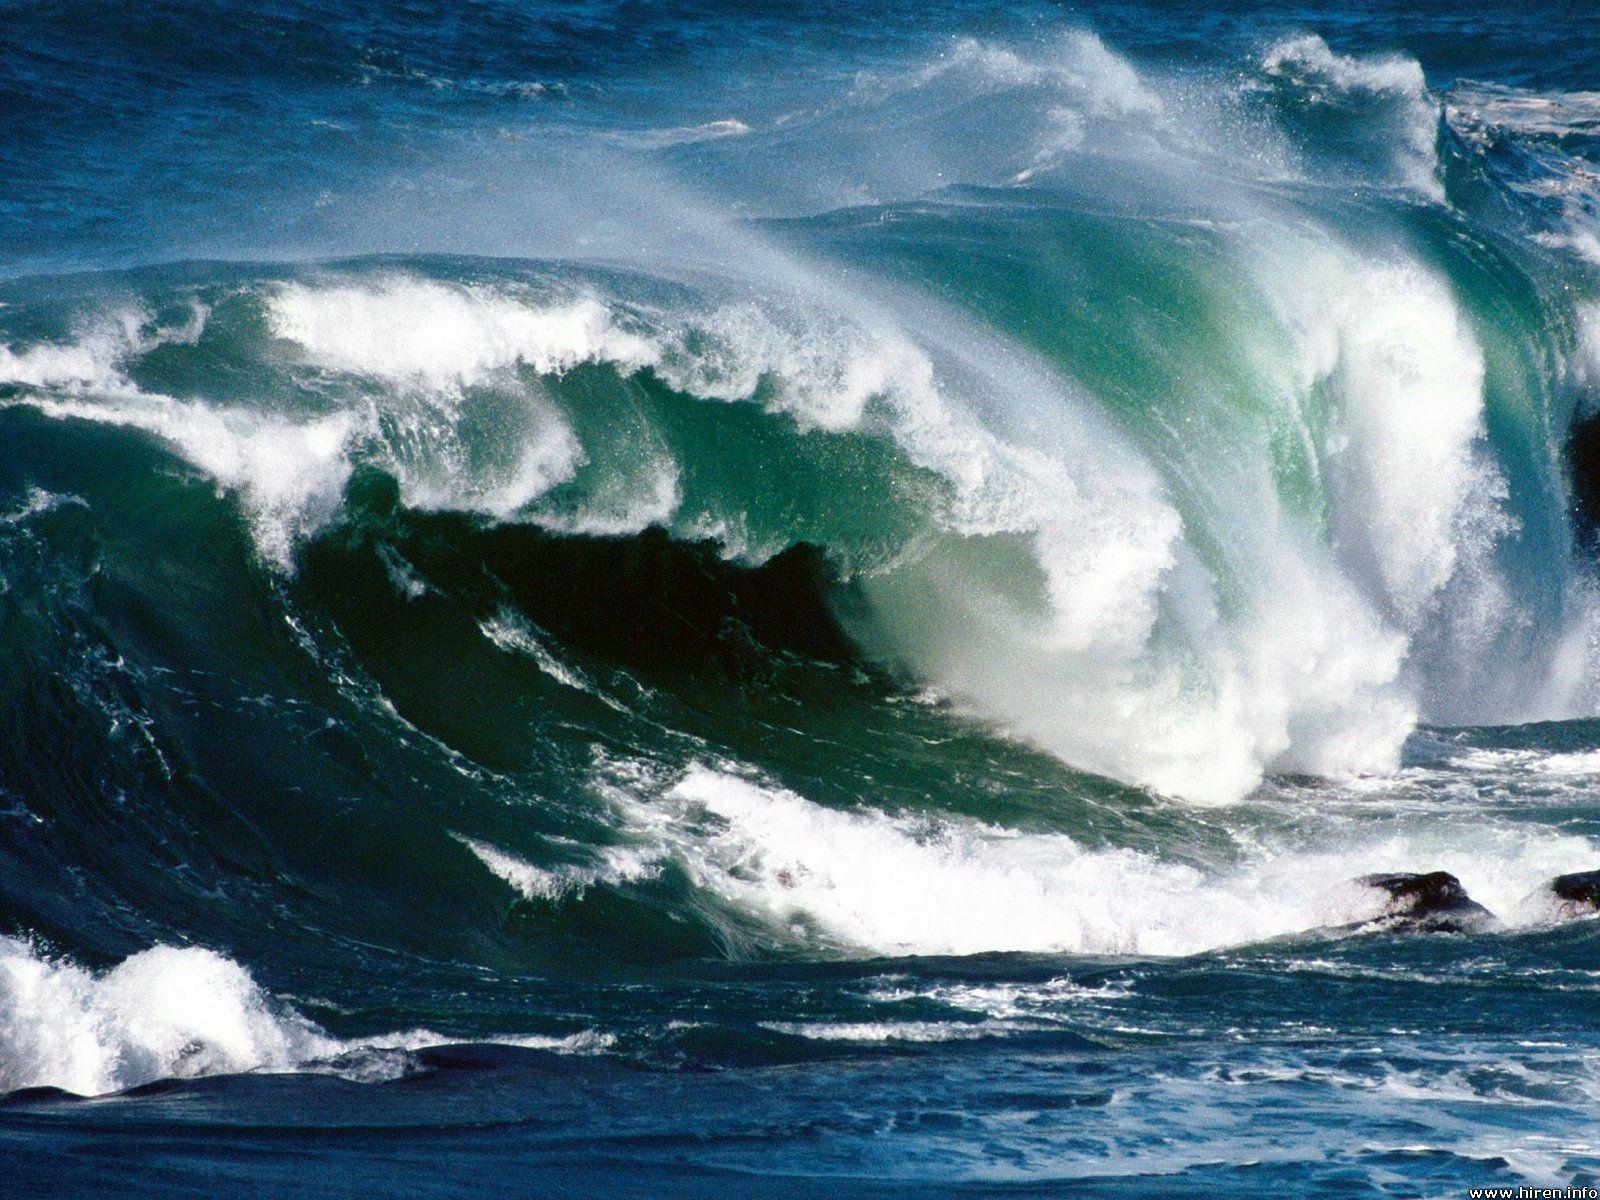 Pin by velukutty balakrishnan on Waves | Ocean waves, Ocean